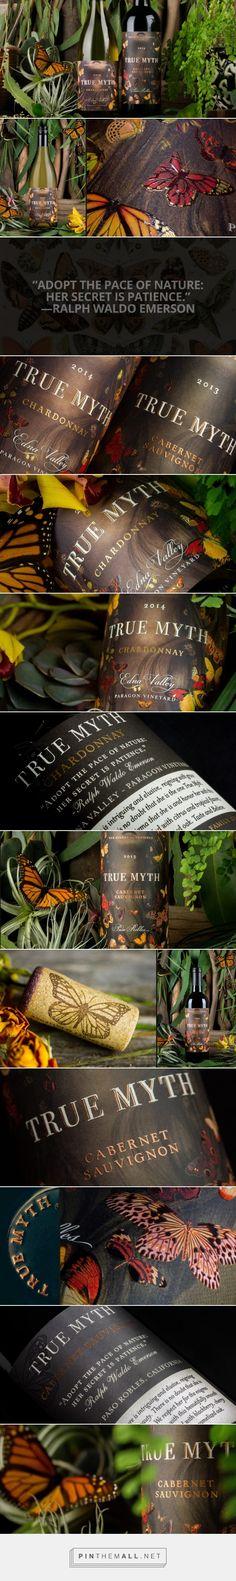 True Myth Wine - Packaging of the World - Creative Package Design Gallery - http://www.packagingoftheworld.com/2016/04/true-myth-wine.html